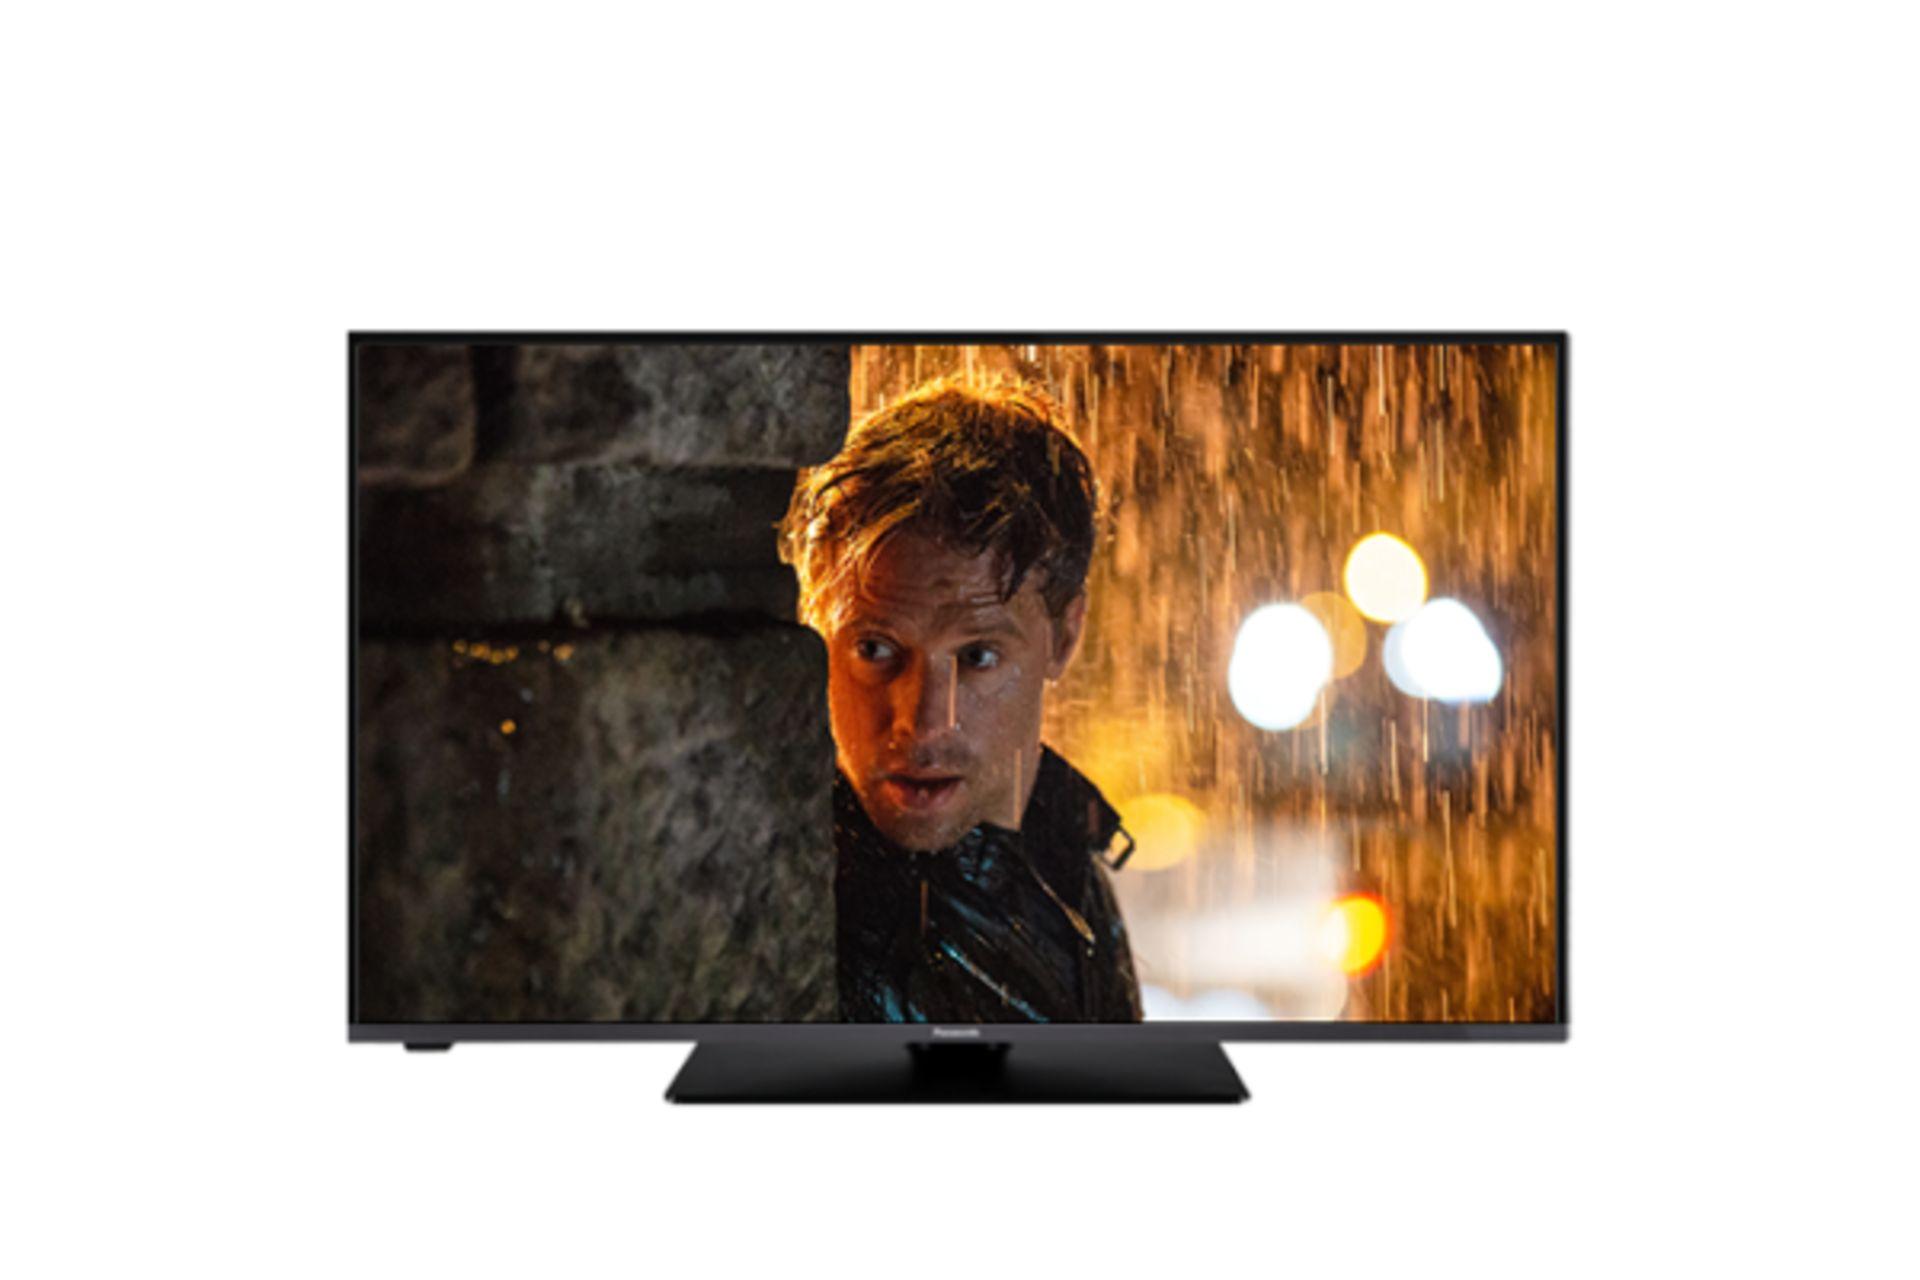 + VAT Grade A 55HX580 Panasonic 55 Inch LED TV